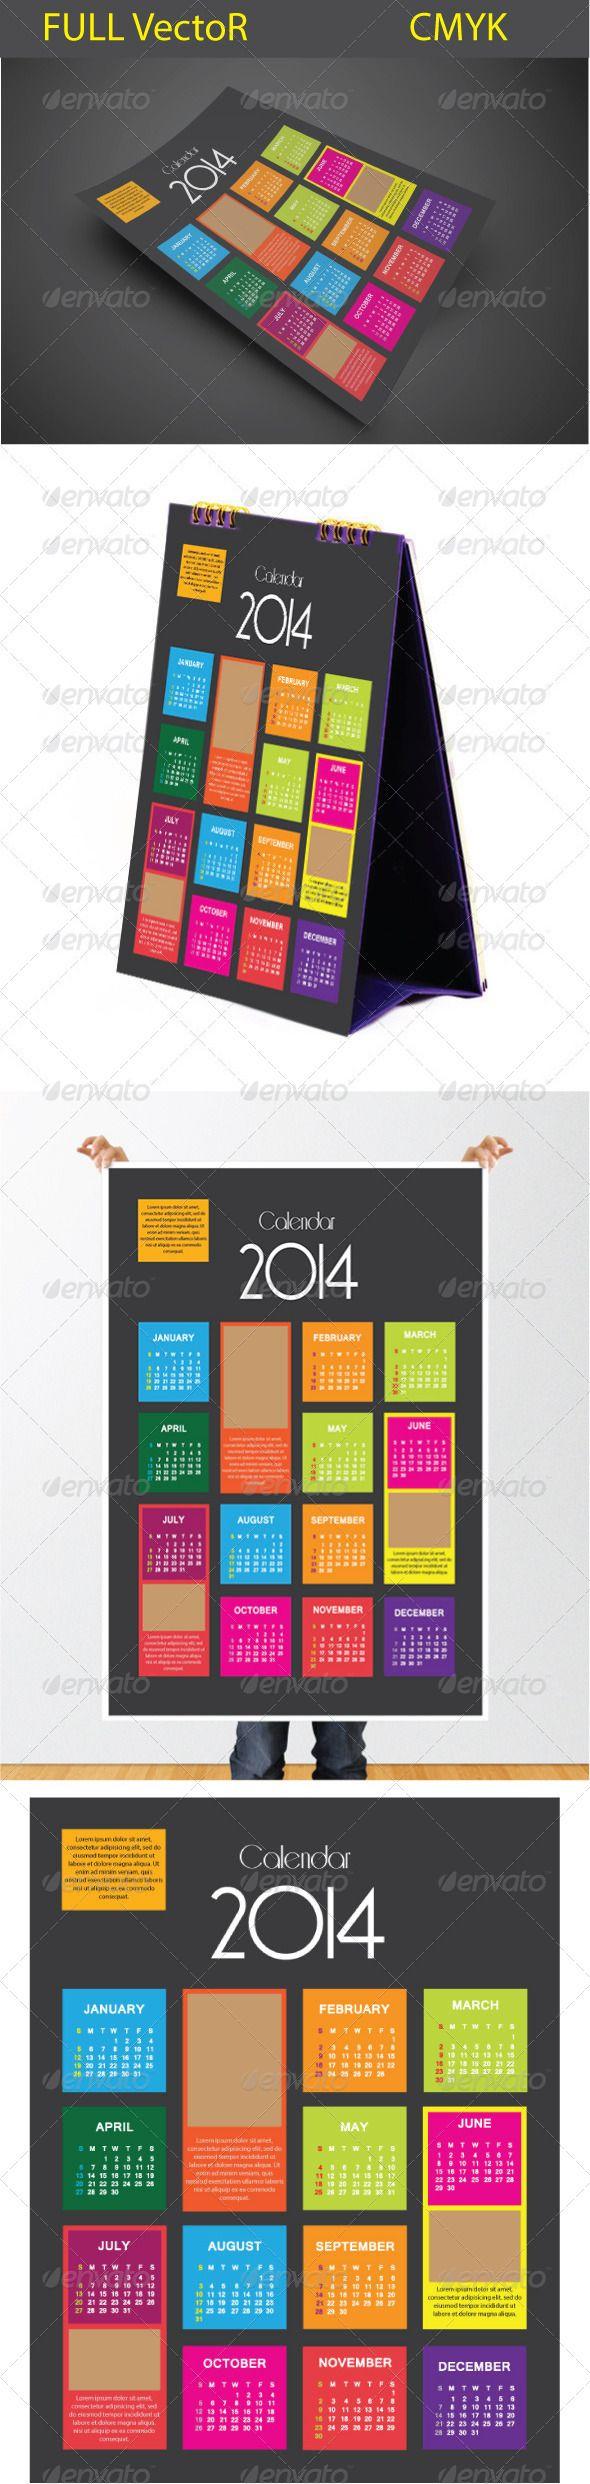 Corporate Calendar Designs : Best images about corporate calendar design on